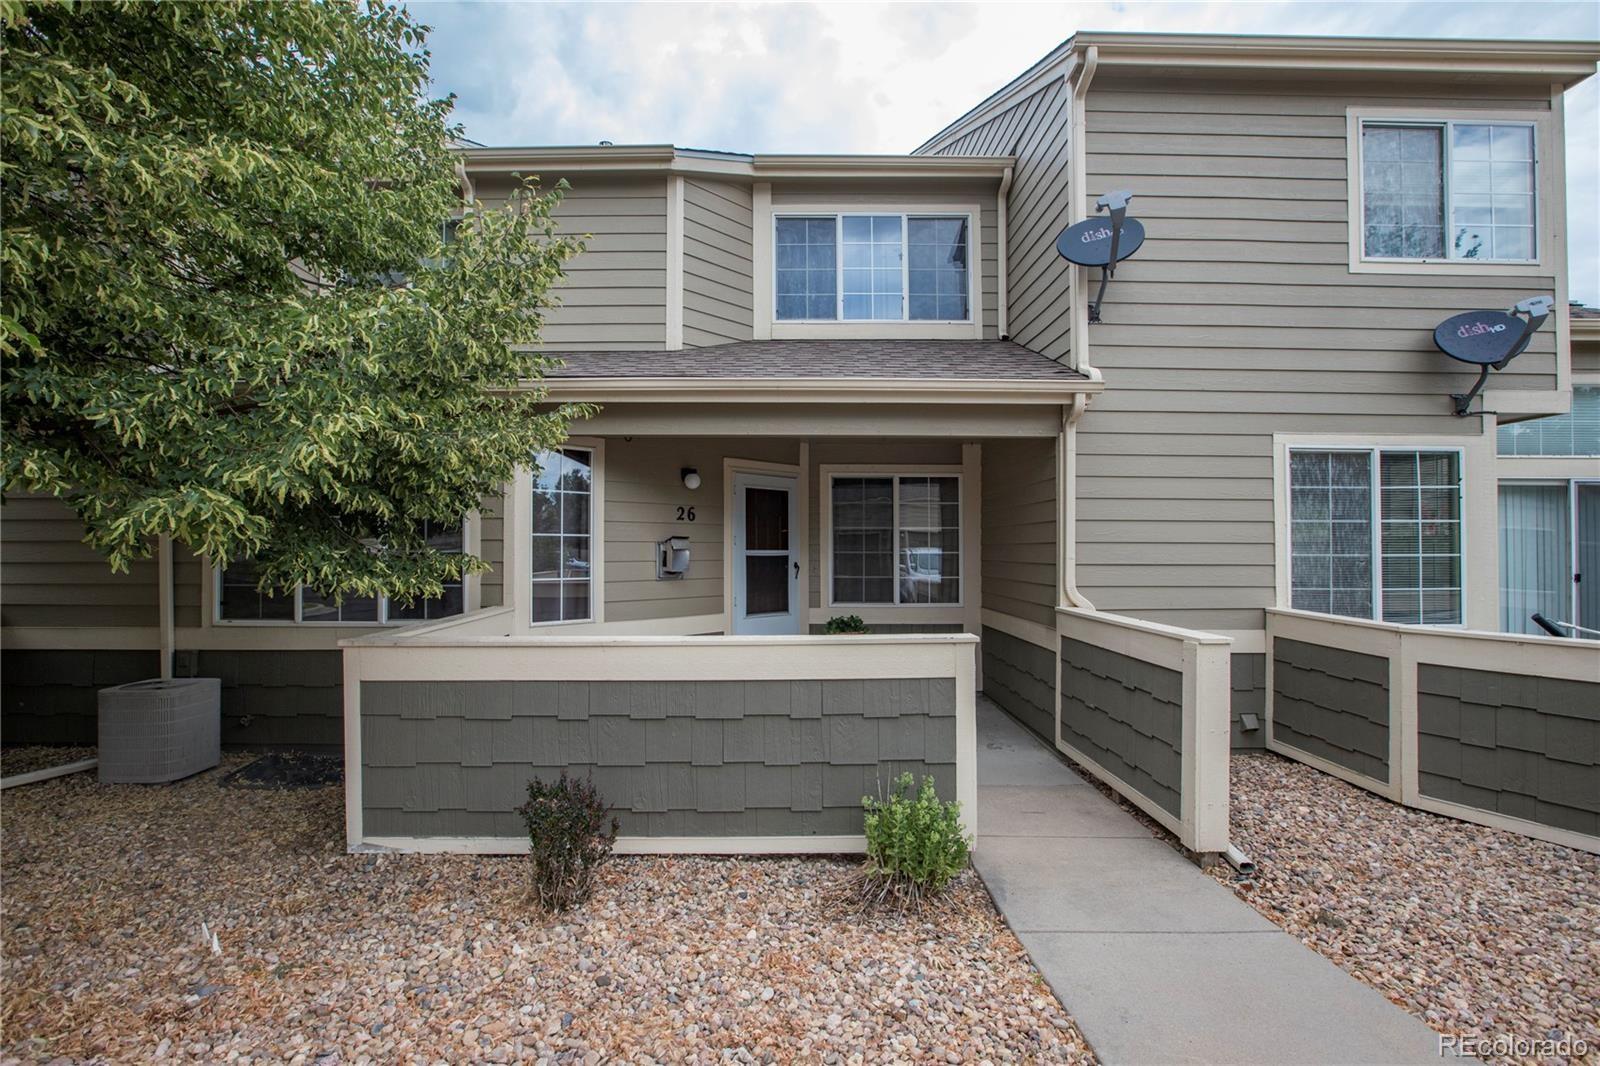 MLS# 3758449 - 1 - 6802 Antigua Drive #26, Fort Collins, CO 80525